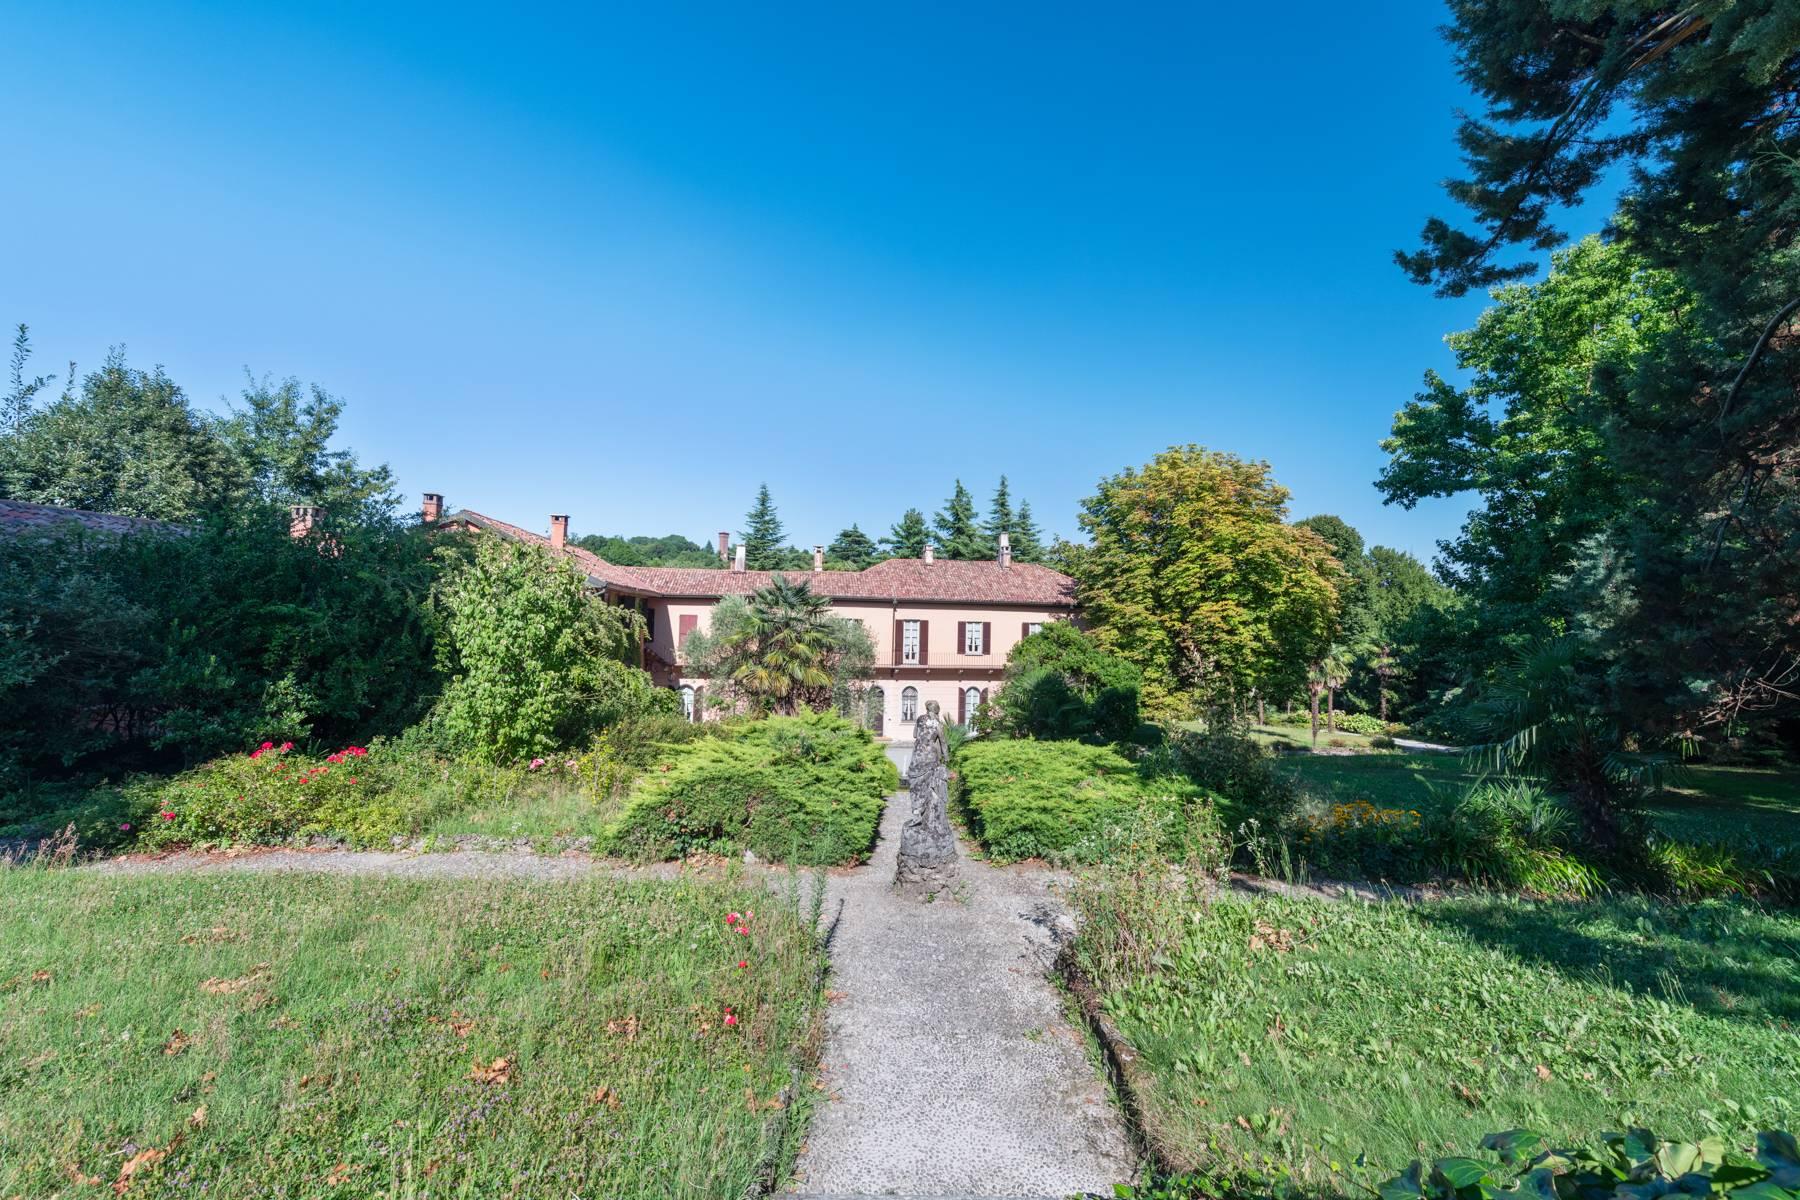 Villa in Vendita a Merate: 5 locali, 1200 mq